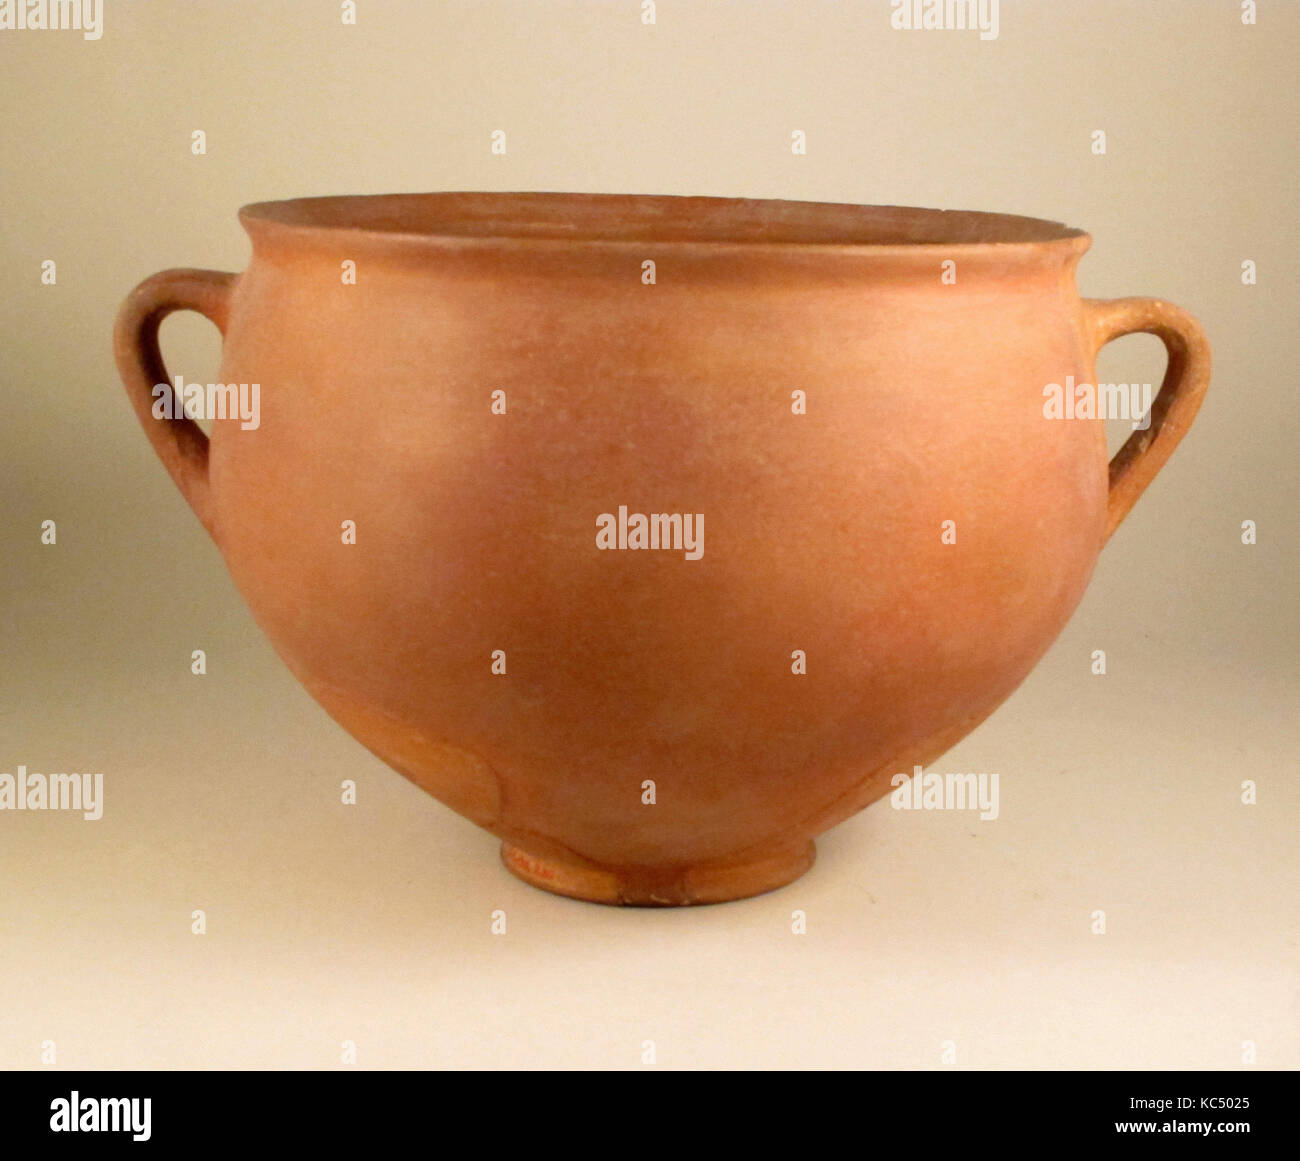 Skyphos, East Greek/Sardis, Lydian, Terracotta, 6 11/16 x 10 3/4in. (17 x 27.3cm), Vases Stock Photo